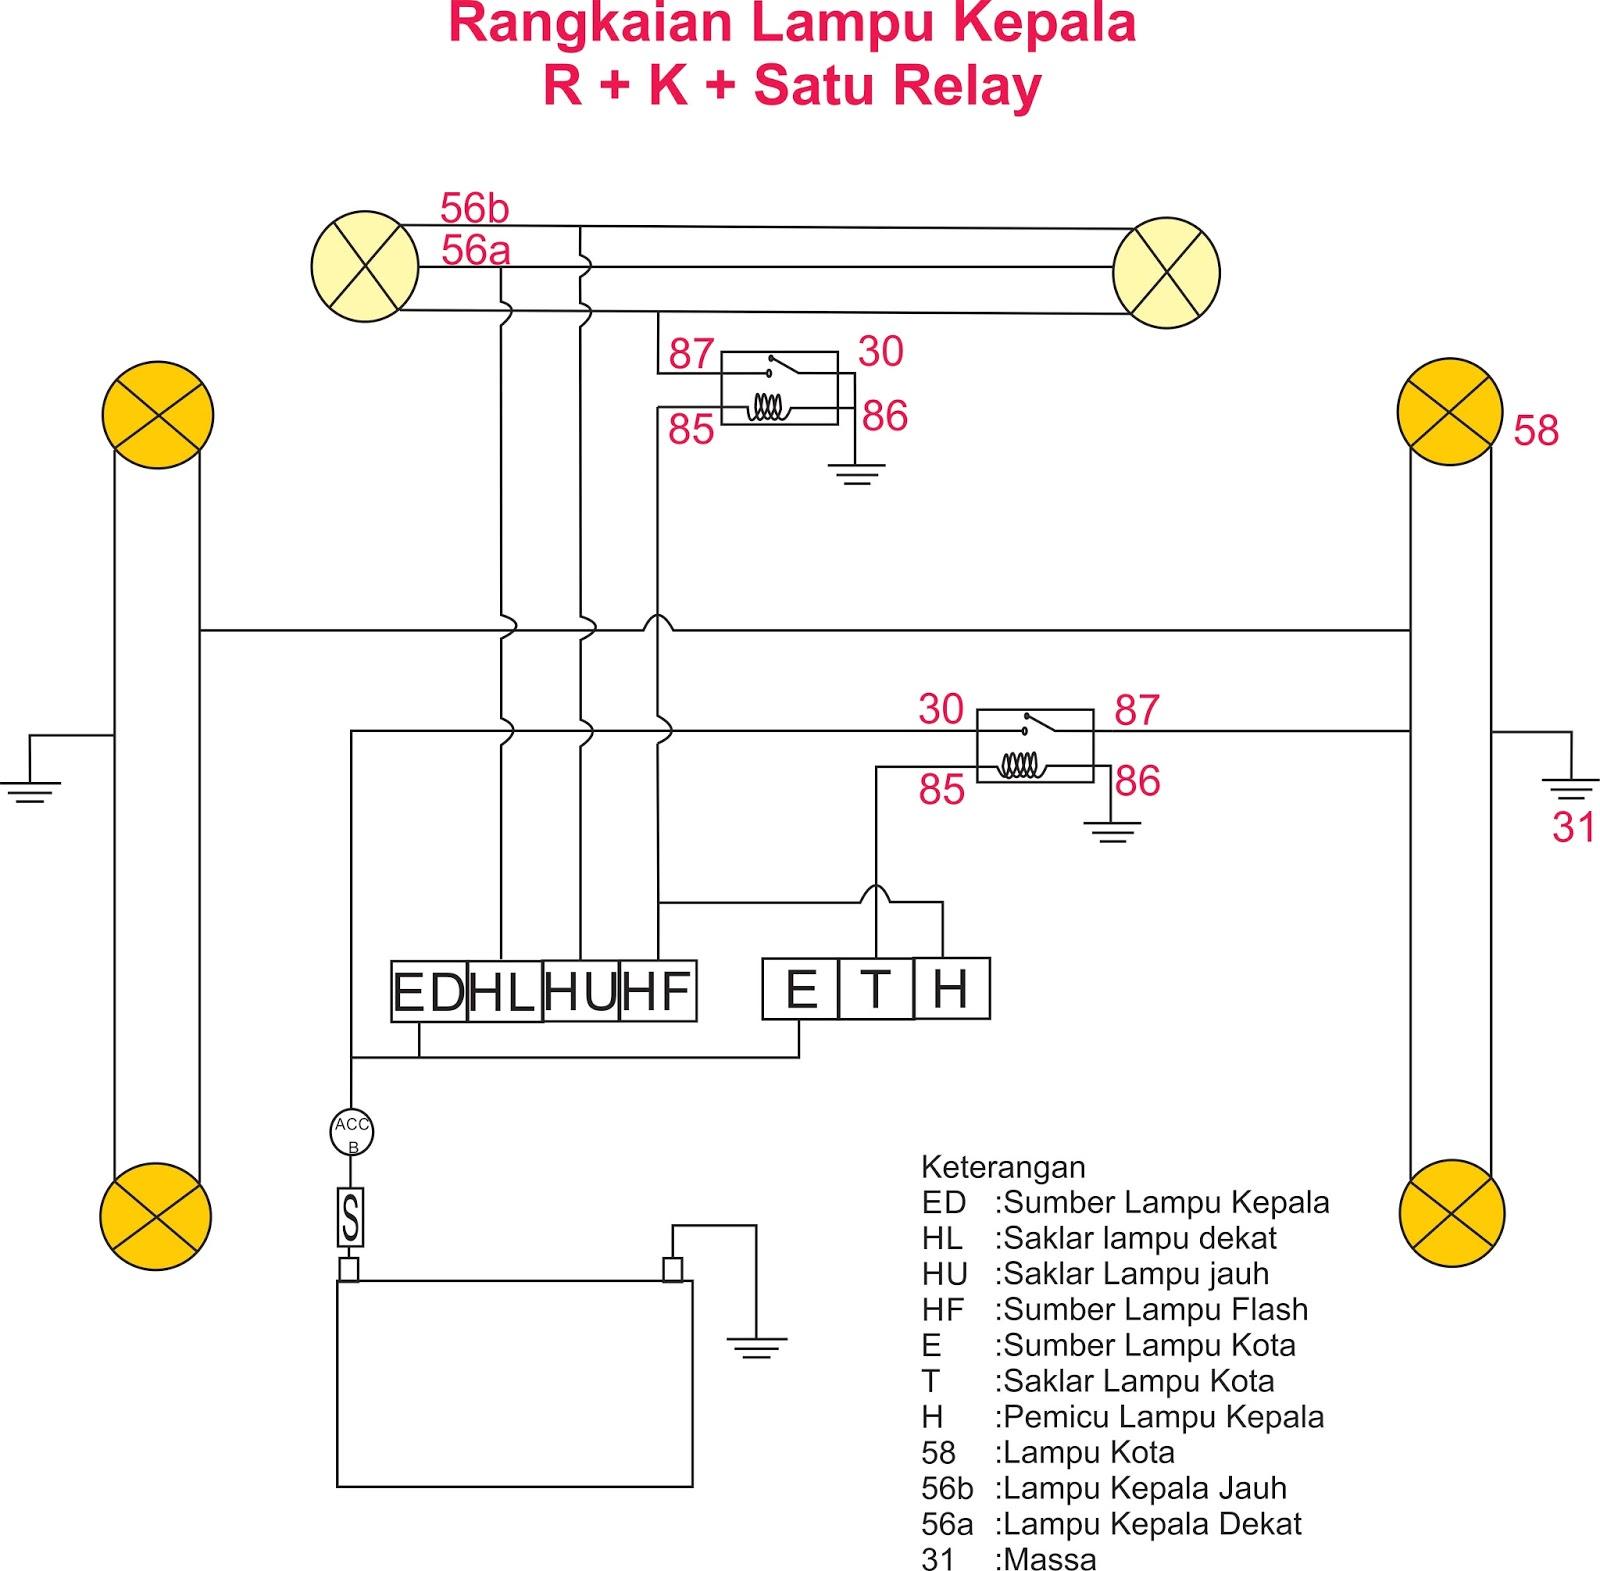 Teknologi otomotif system kelistrikan body wiring diagram lampu kepala a rangkaian positif kendali positif 2 relay b rangkaian positif kendali positif 1 relay swarovskicordoba Gallery